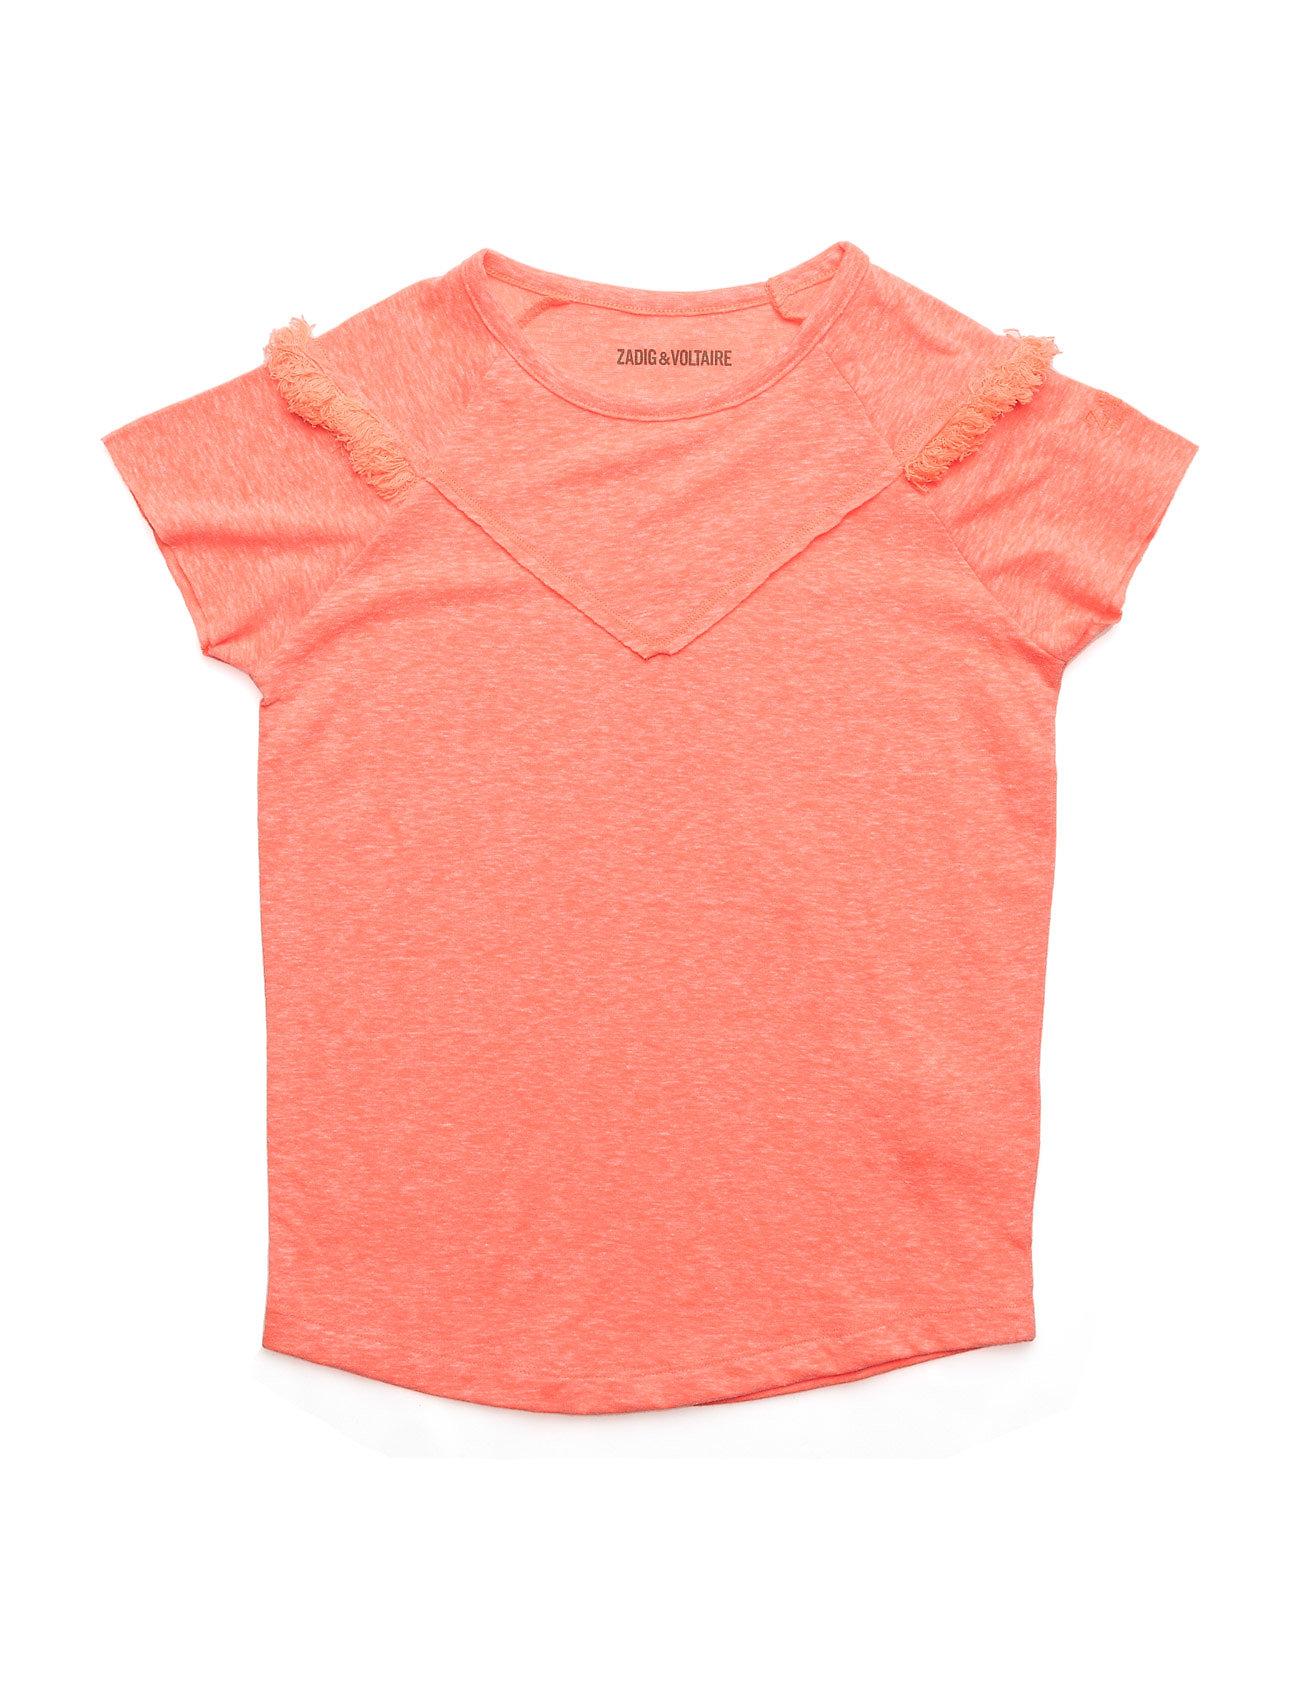 zadig & voltaire – Short sleeves tee-shirt fra boozt.com dk